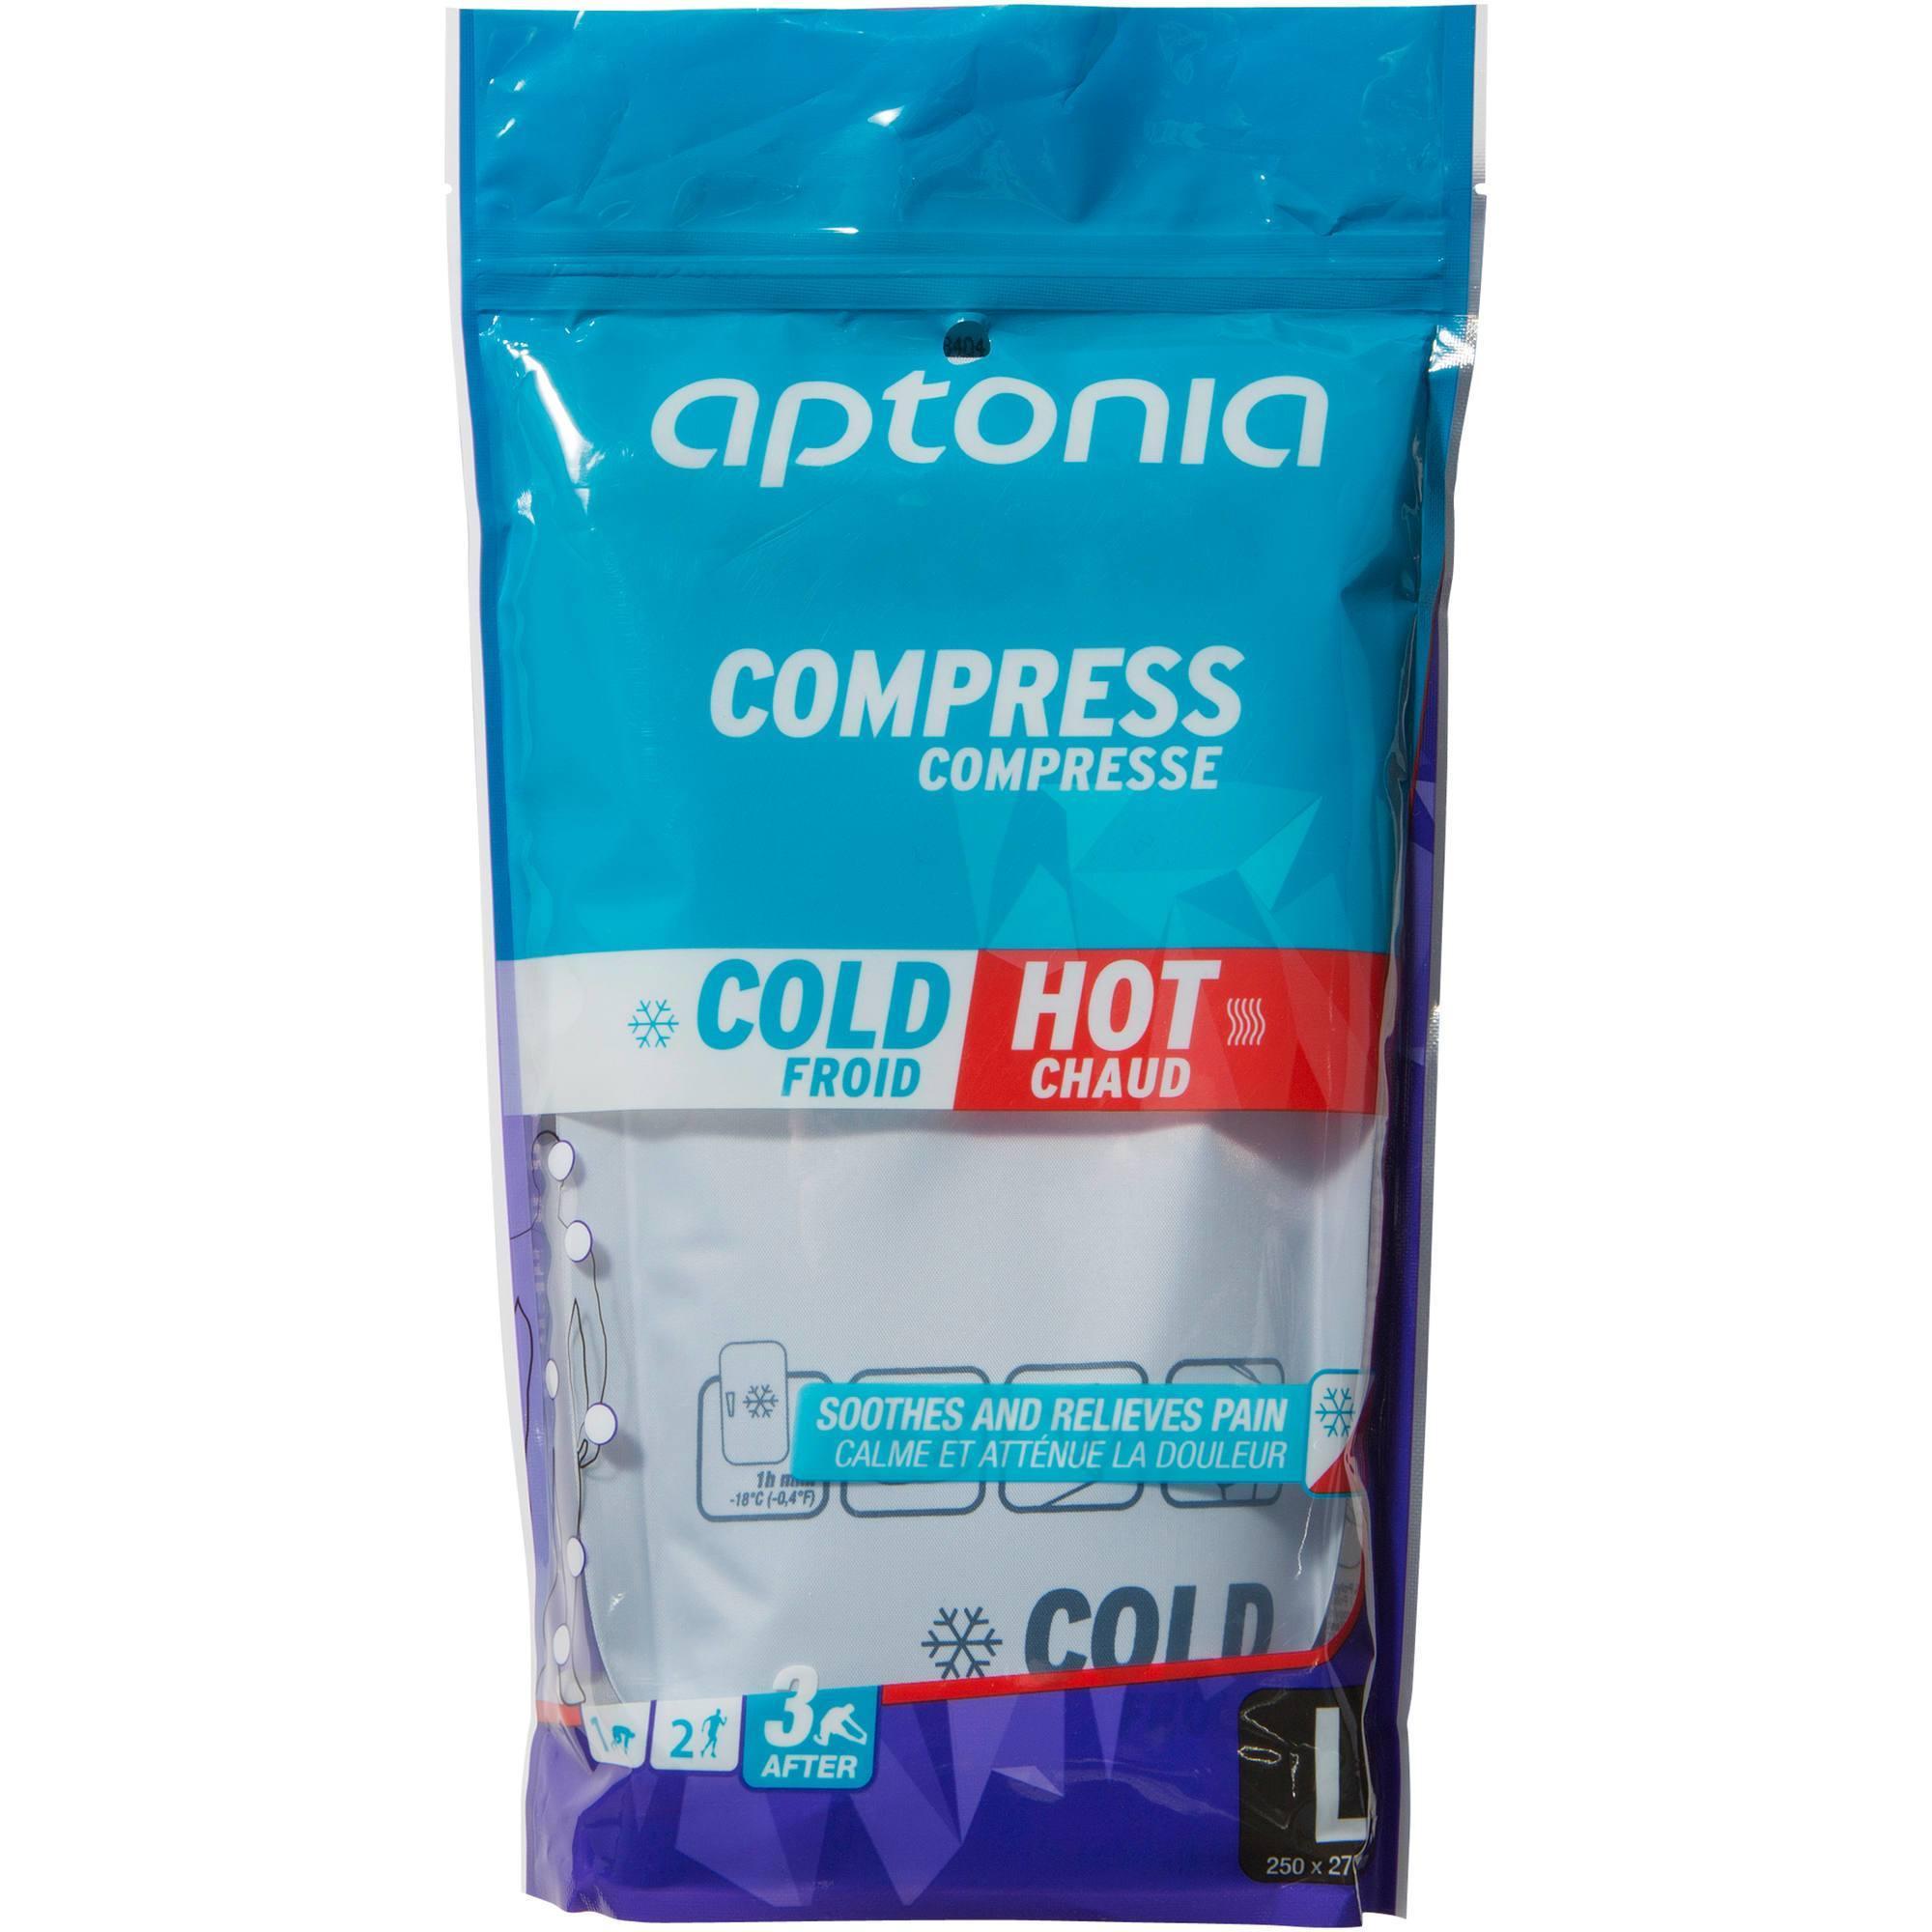 Compresse Chaud/Froid , poche de froid, Taille L